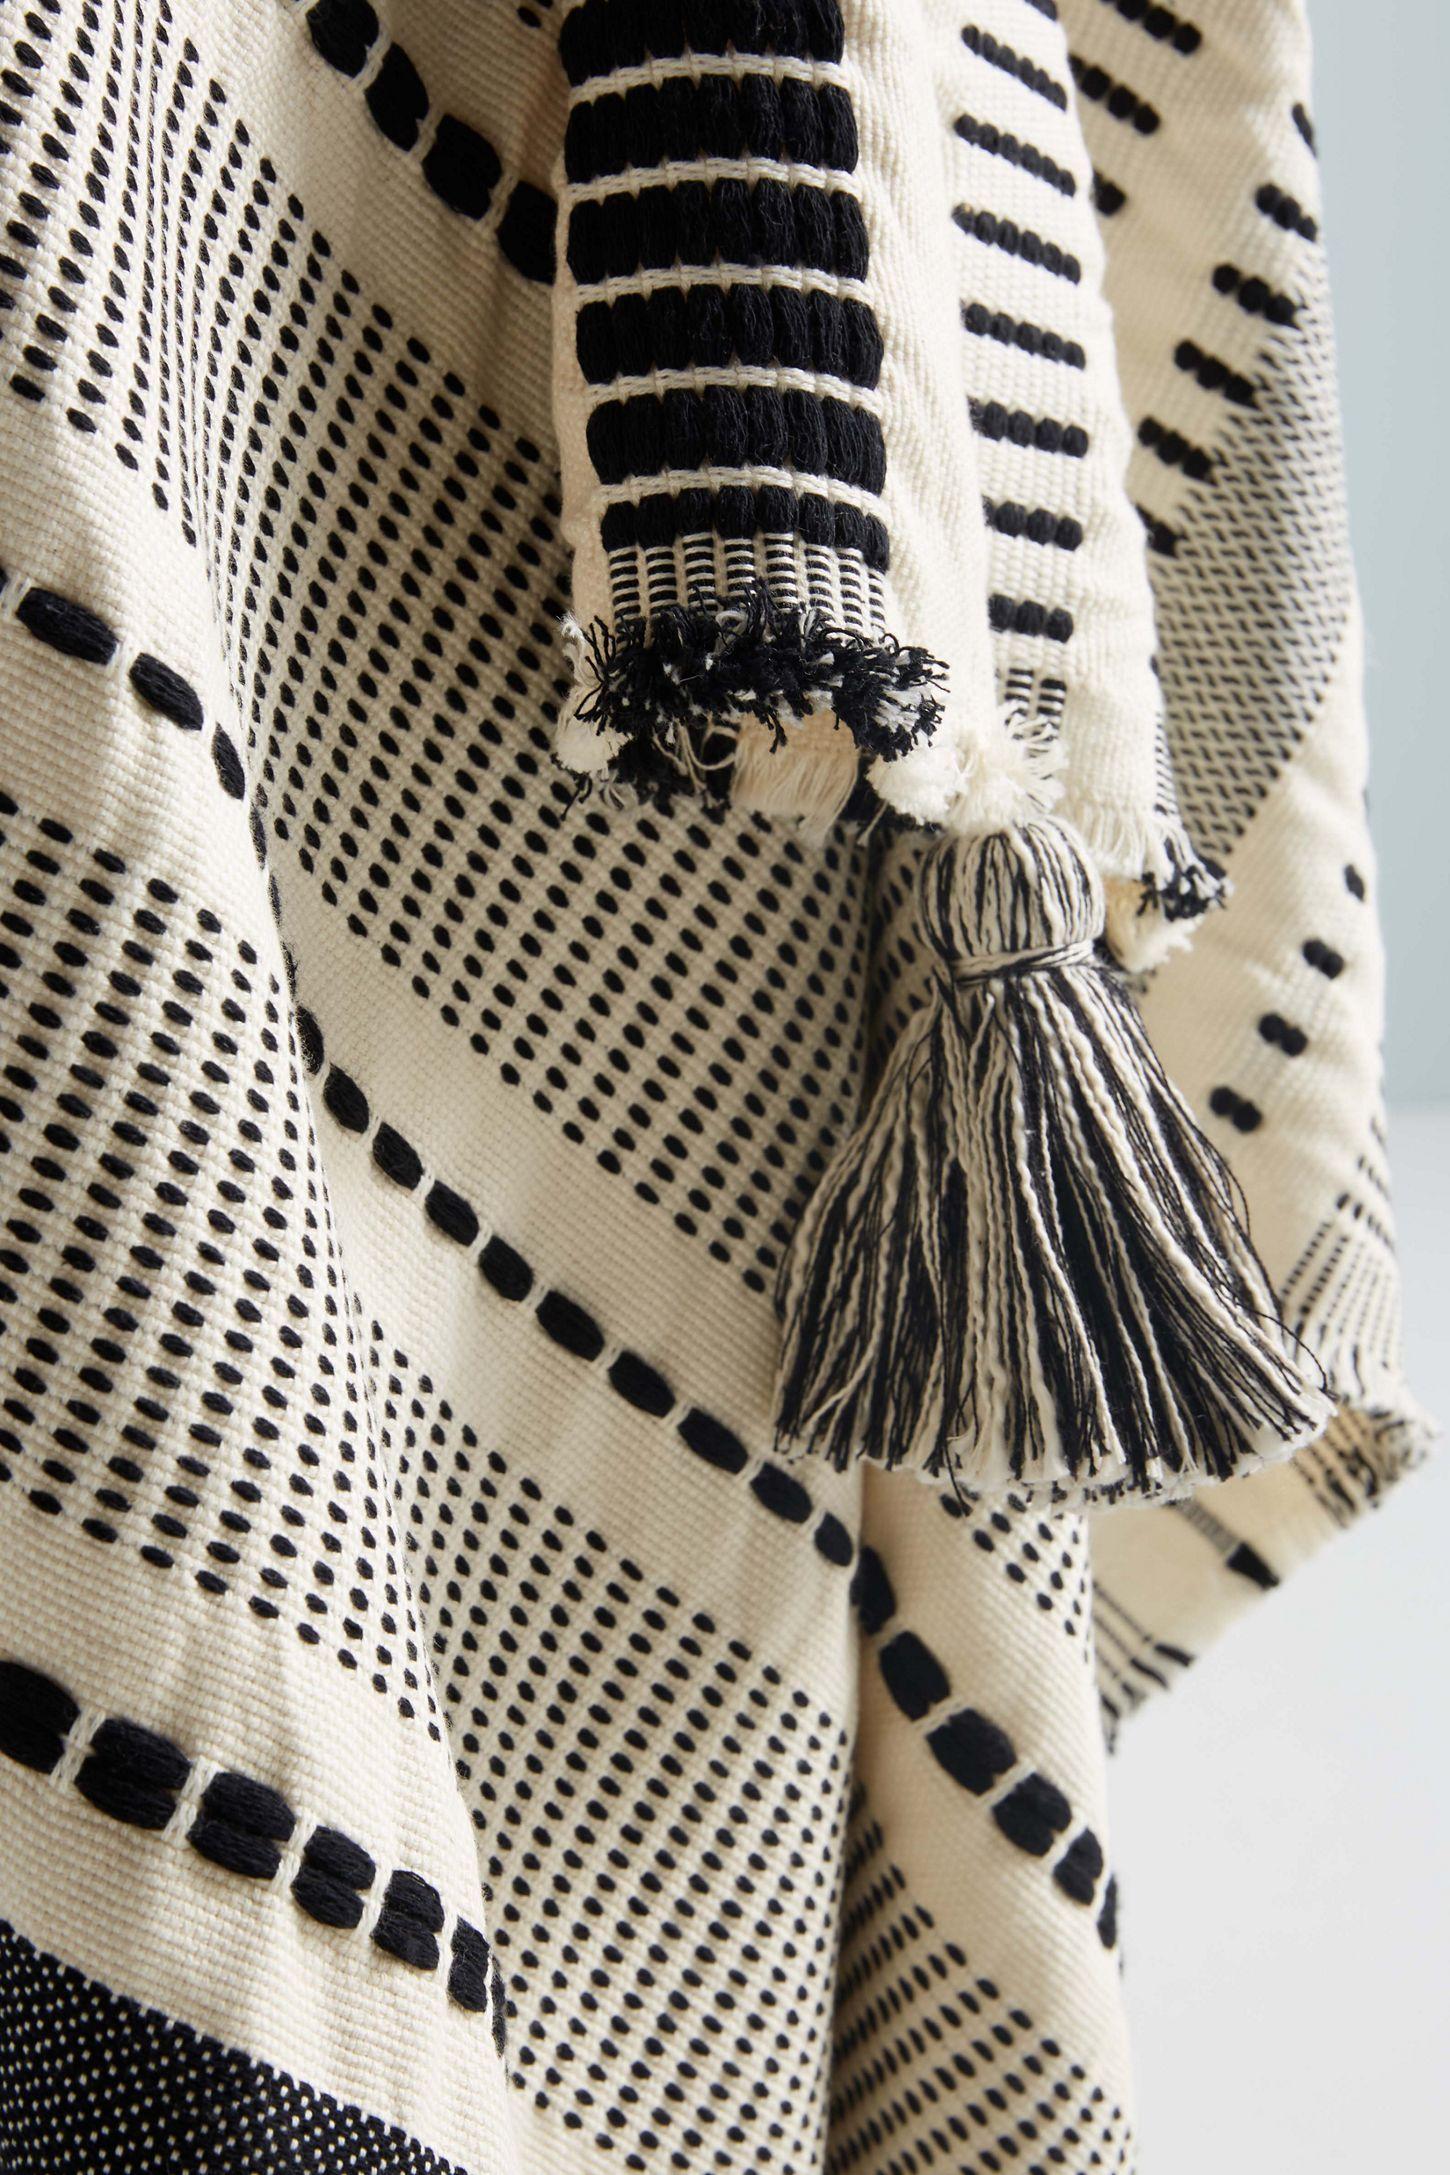 Zephyr Throw Blanket Anthropologie Unique Throw Blankets Boho Throw Blanket Bed Throws